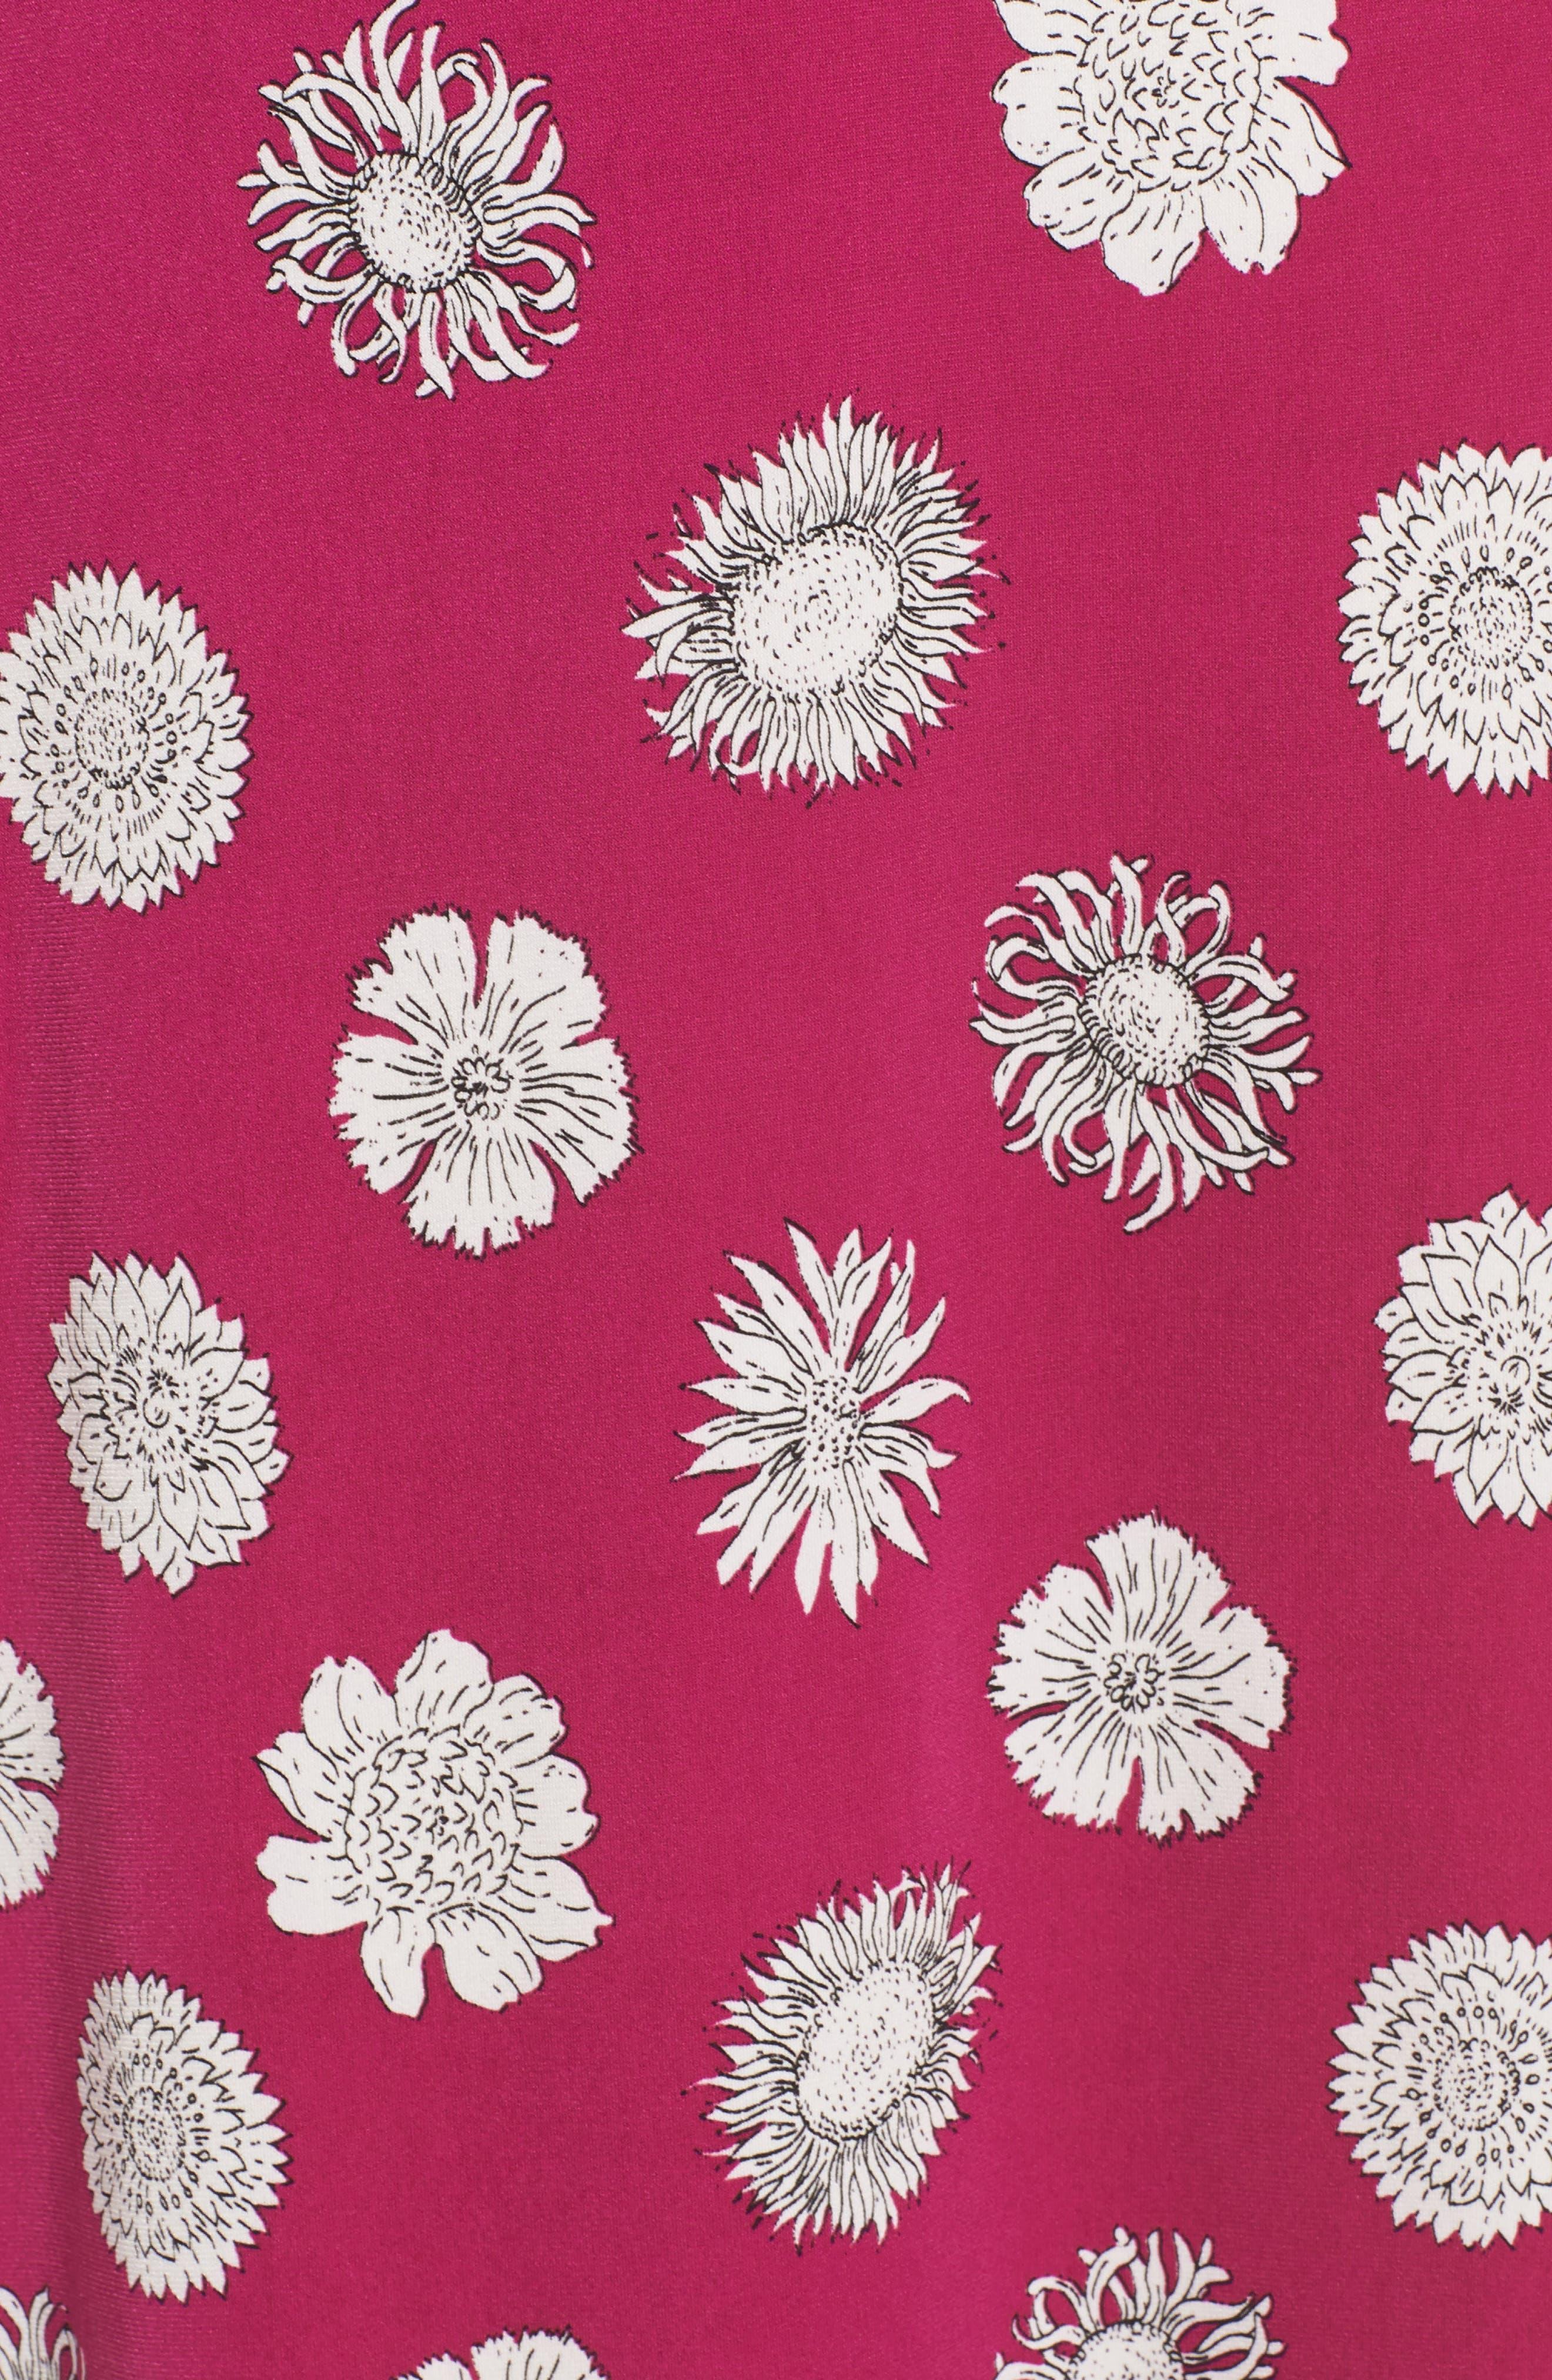 Botanical Tropics Halter Maxi Dress,                             Alternate thumbnail 6, color,                             Fuchsia Fury